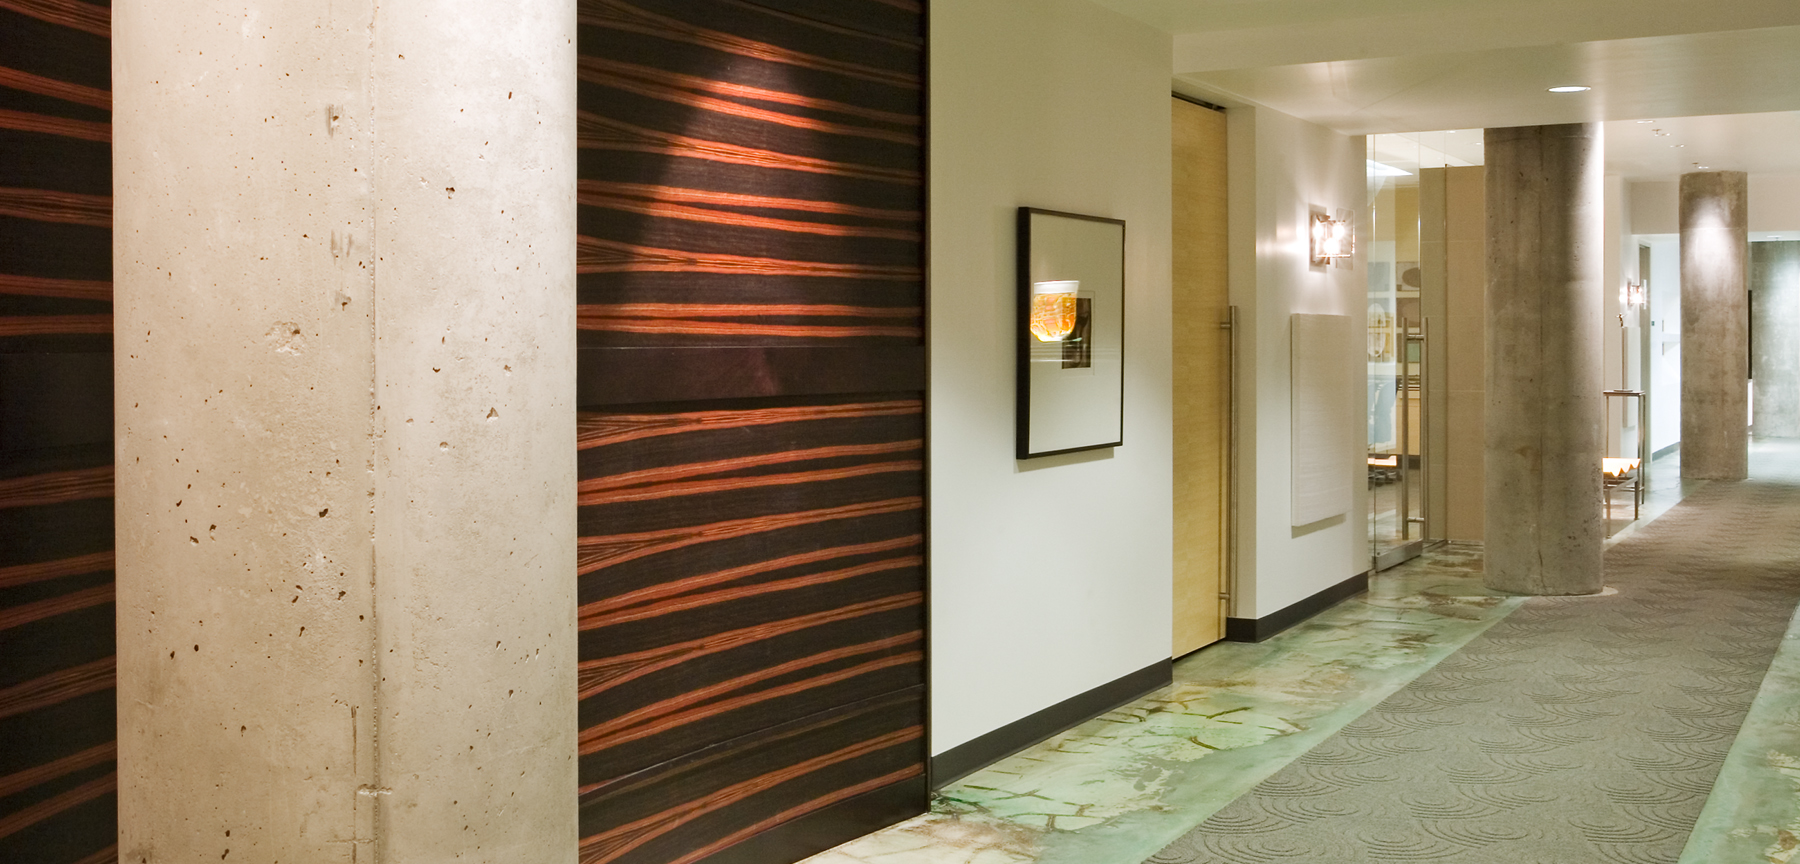 McGeady Sisneros hallway